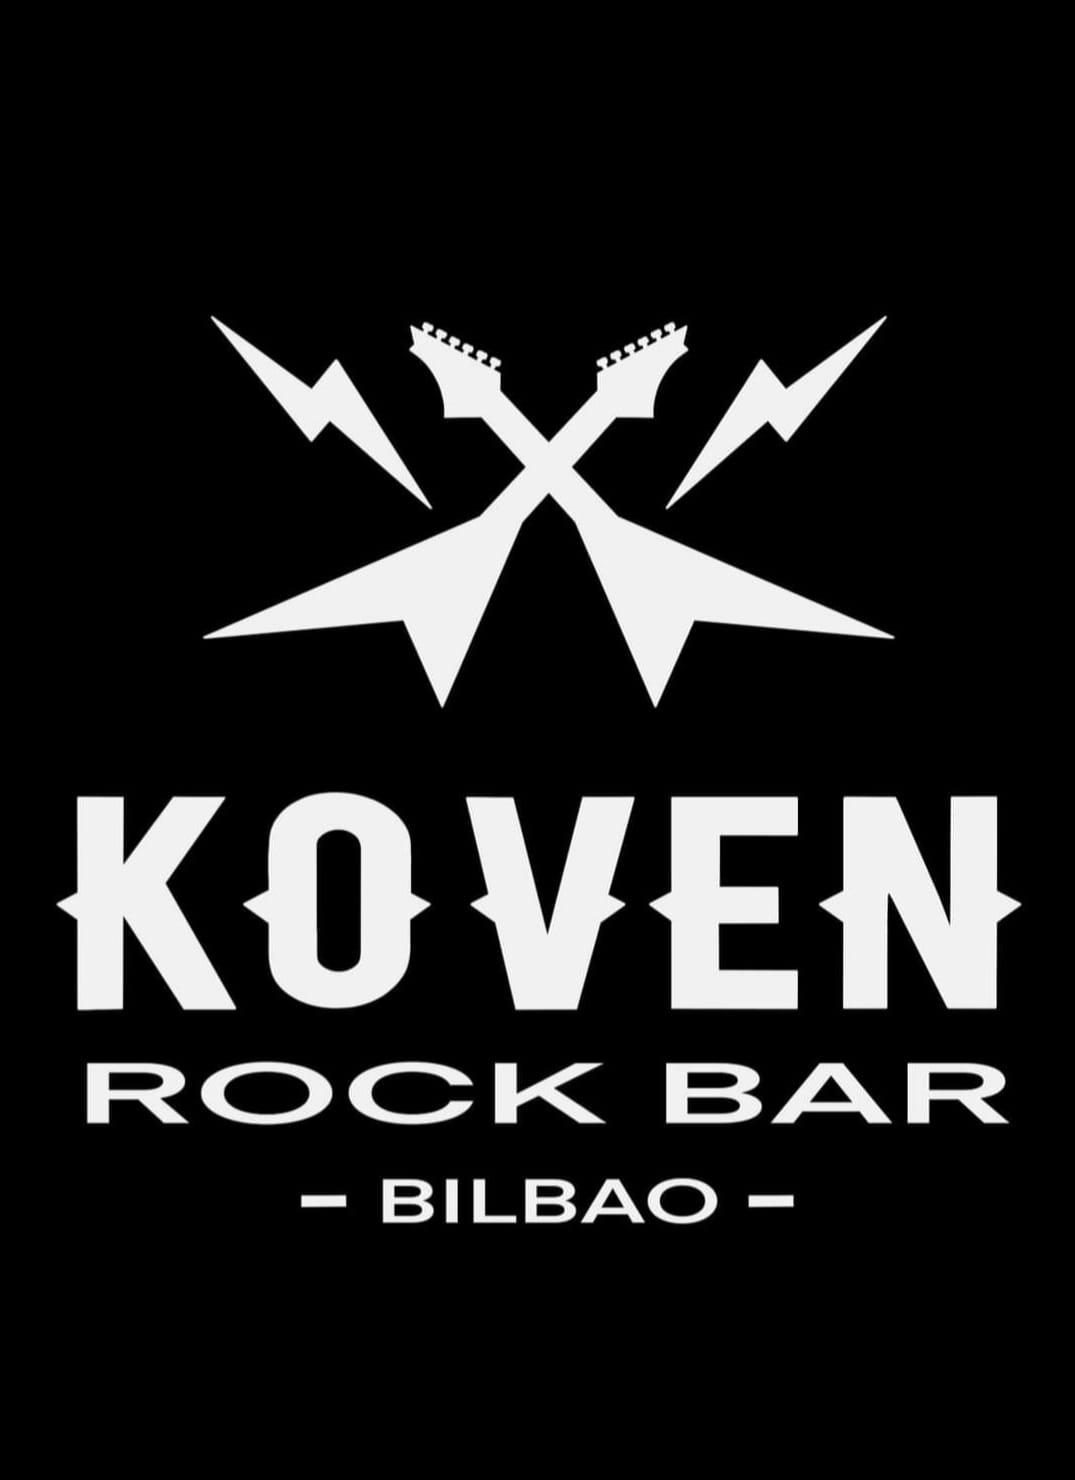 koven rock bar